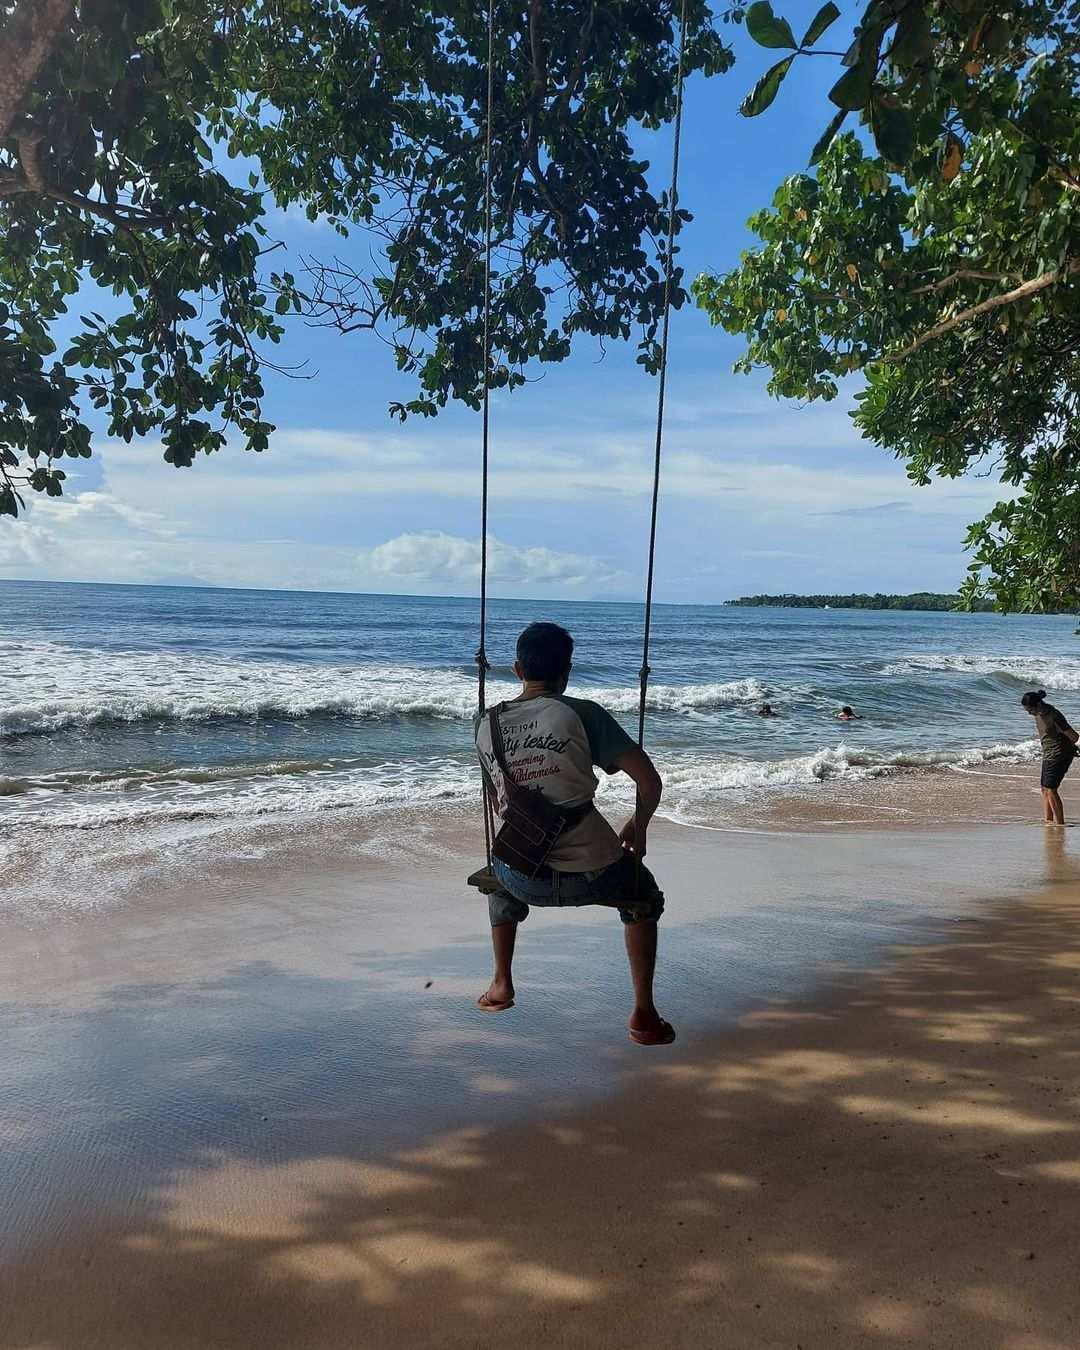 Bermain Ayunan di Pantai Carita Banten Image From @dhatadyafa_2ndstuff